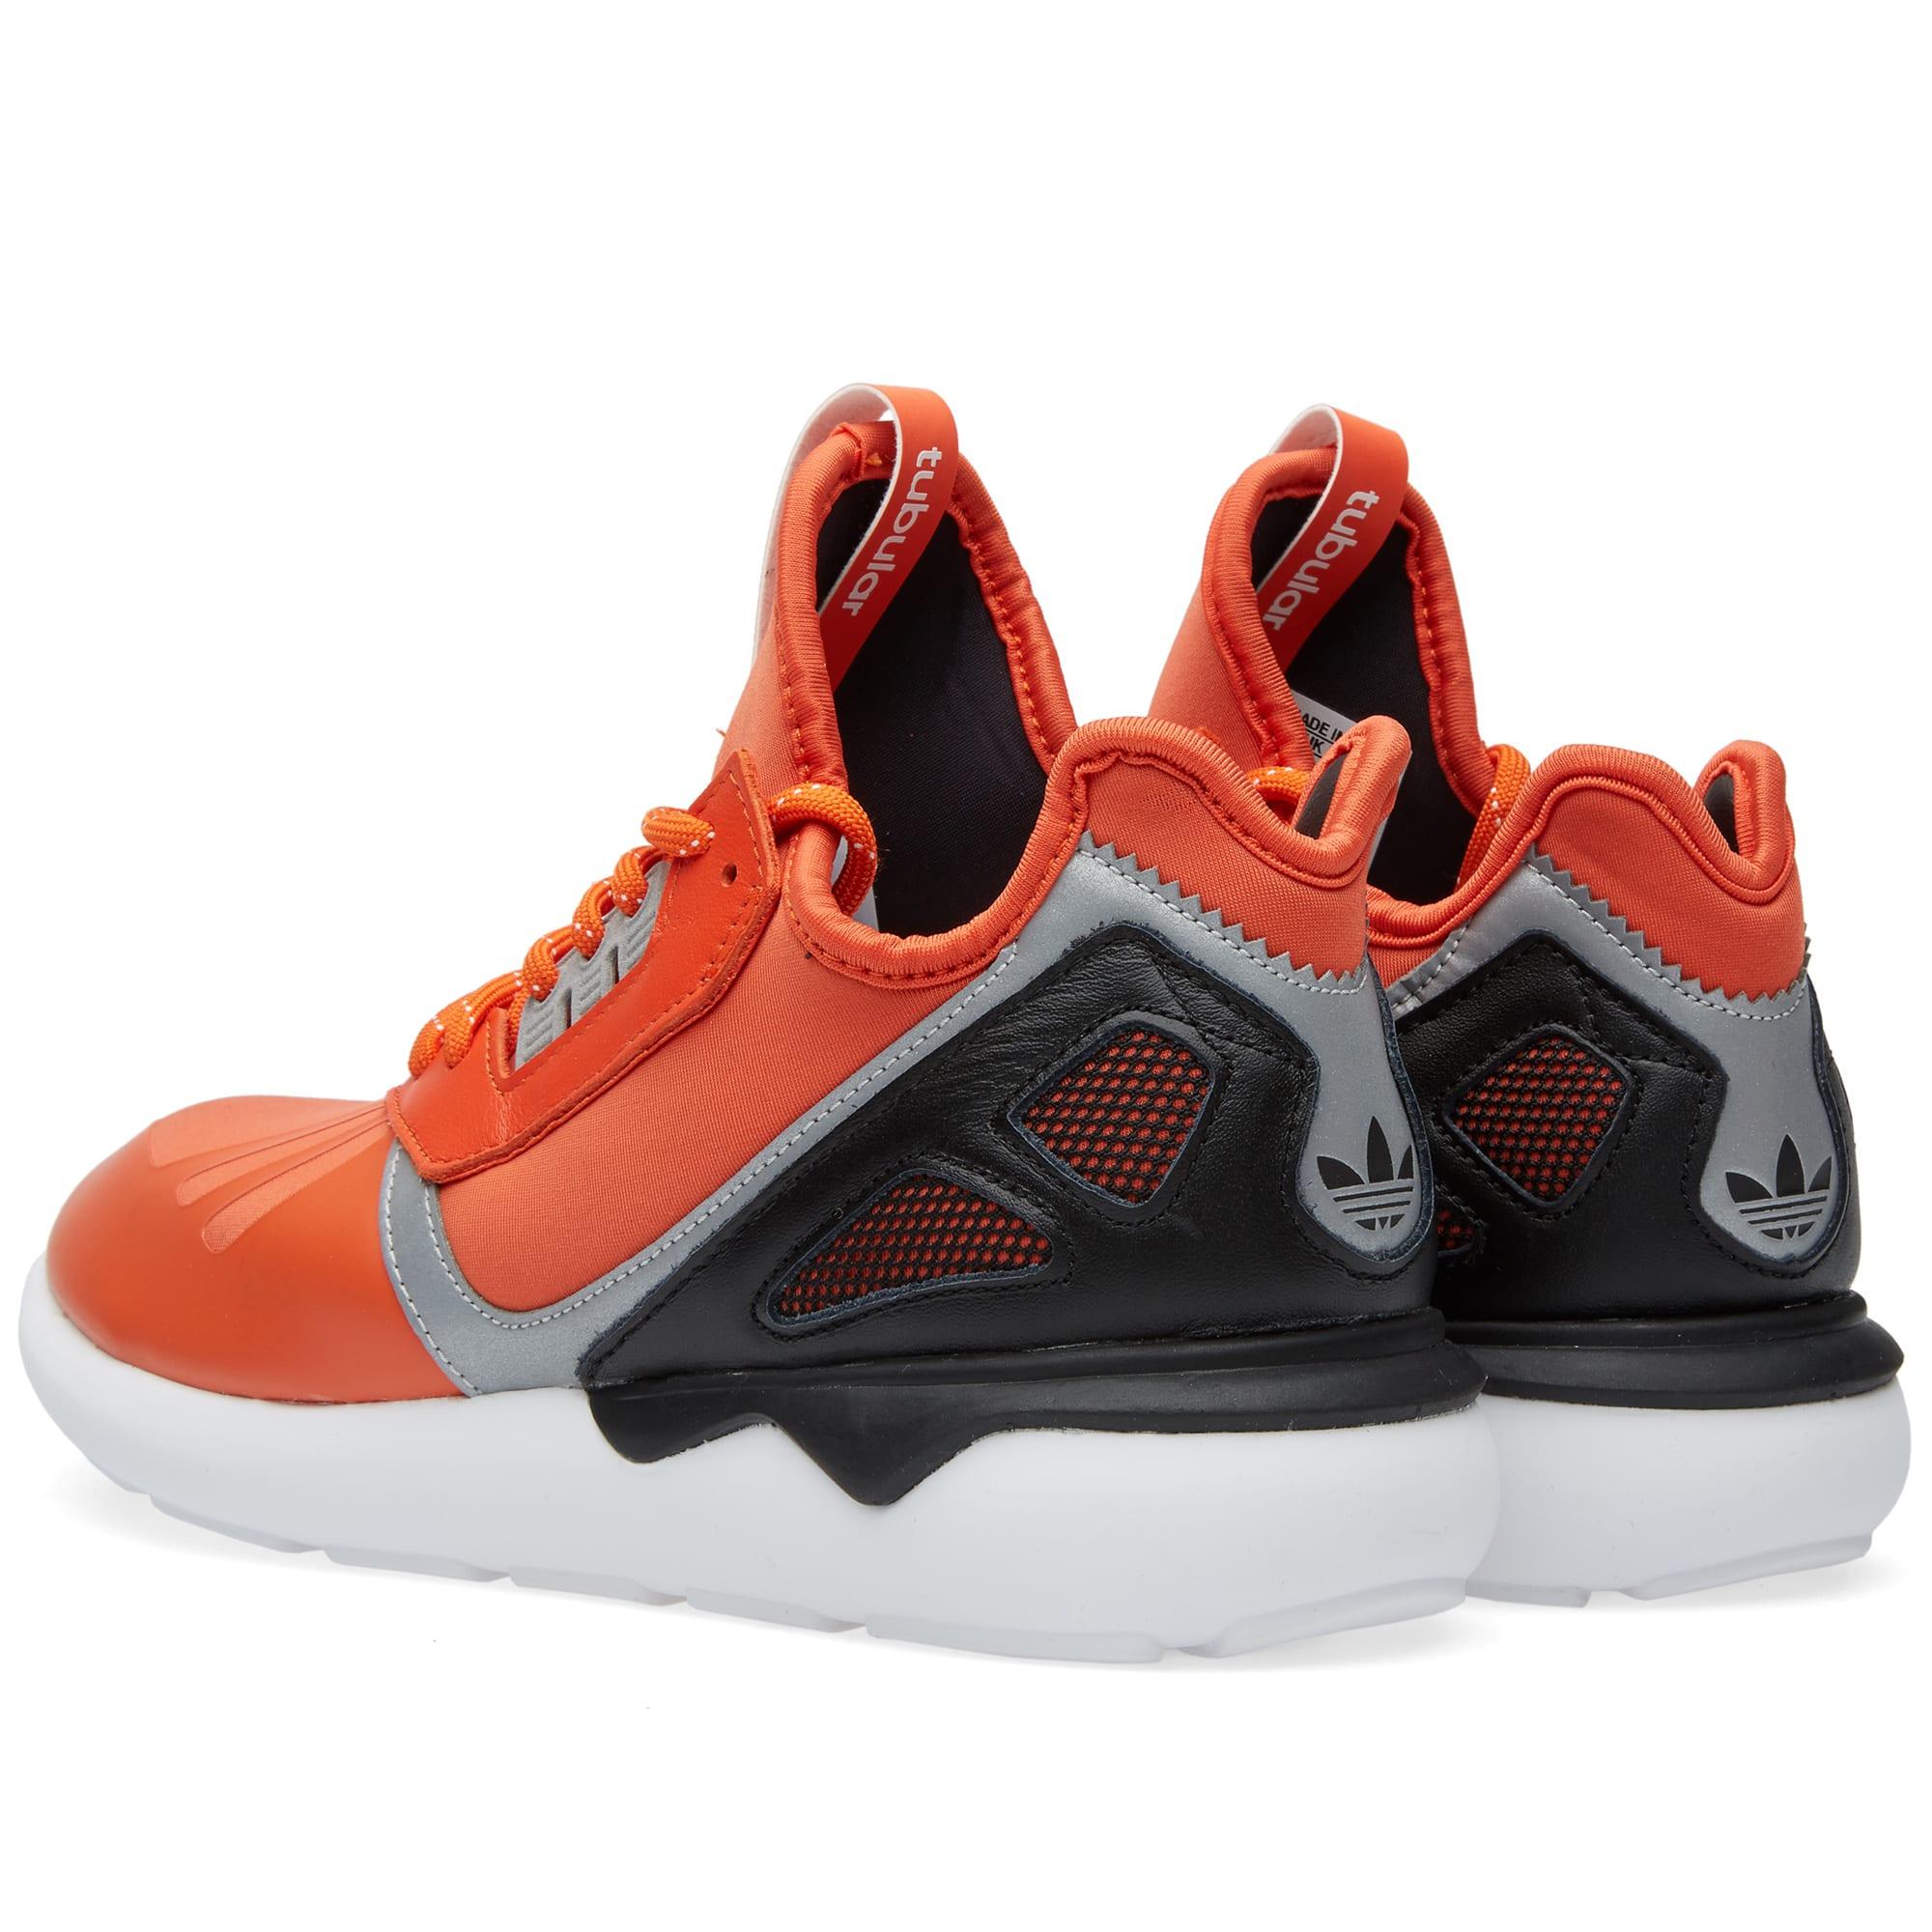 super popular 149b4 e2815 Adidas Tubular Runner Collegiate Orange   Core Black   END.